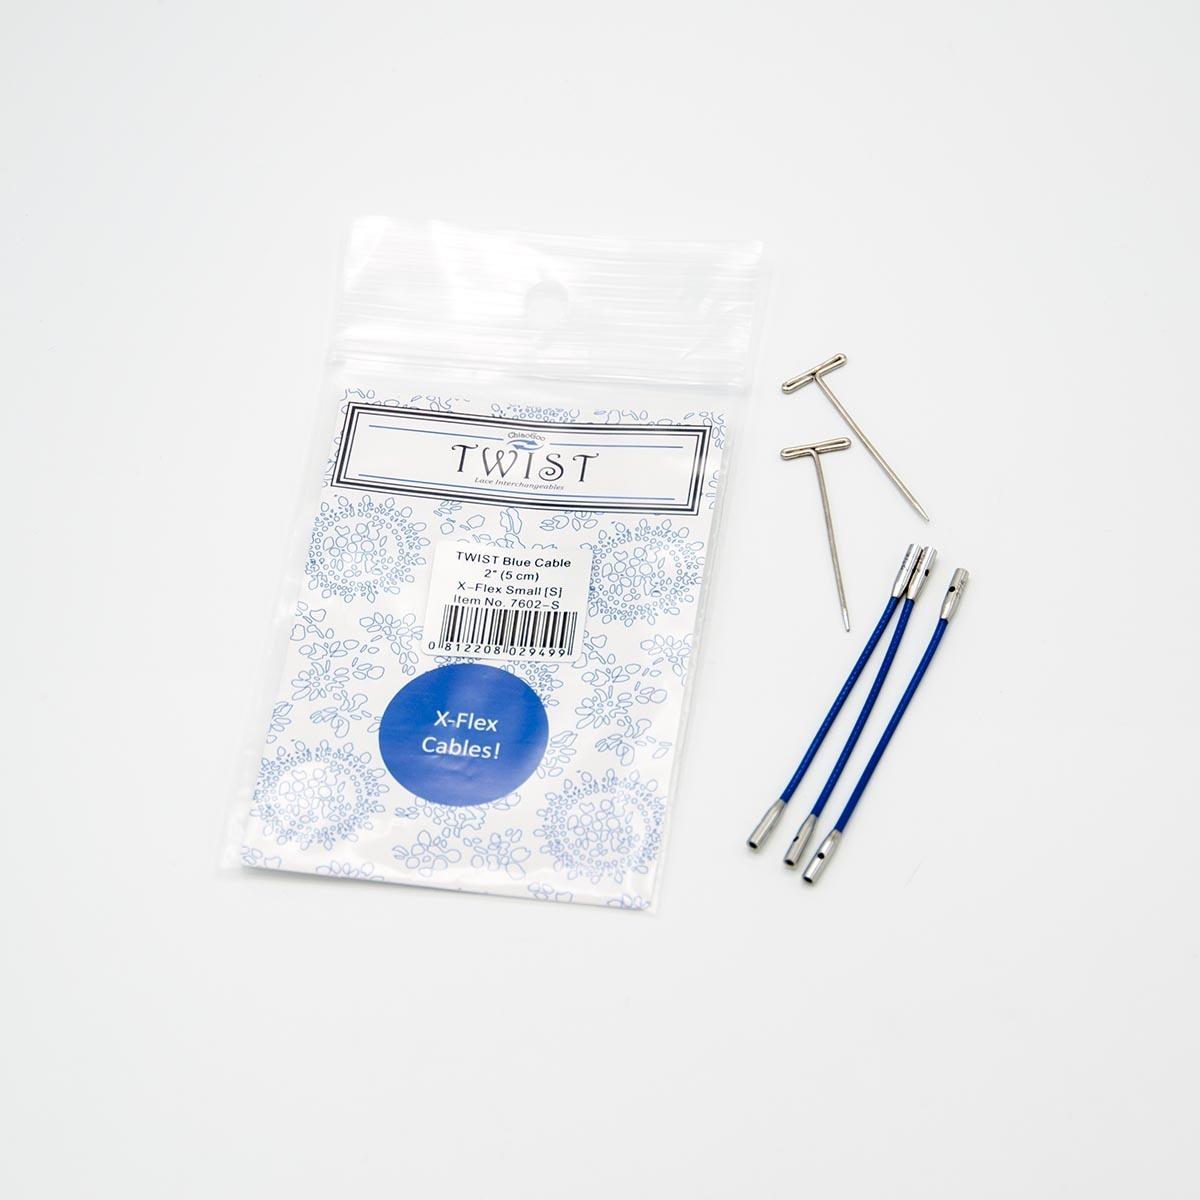 Леска Twist x-flex blue cable 5см, ChiaoGoo